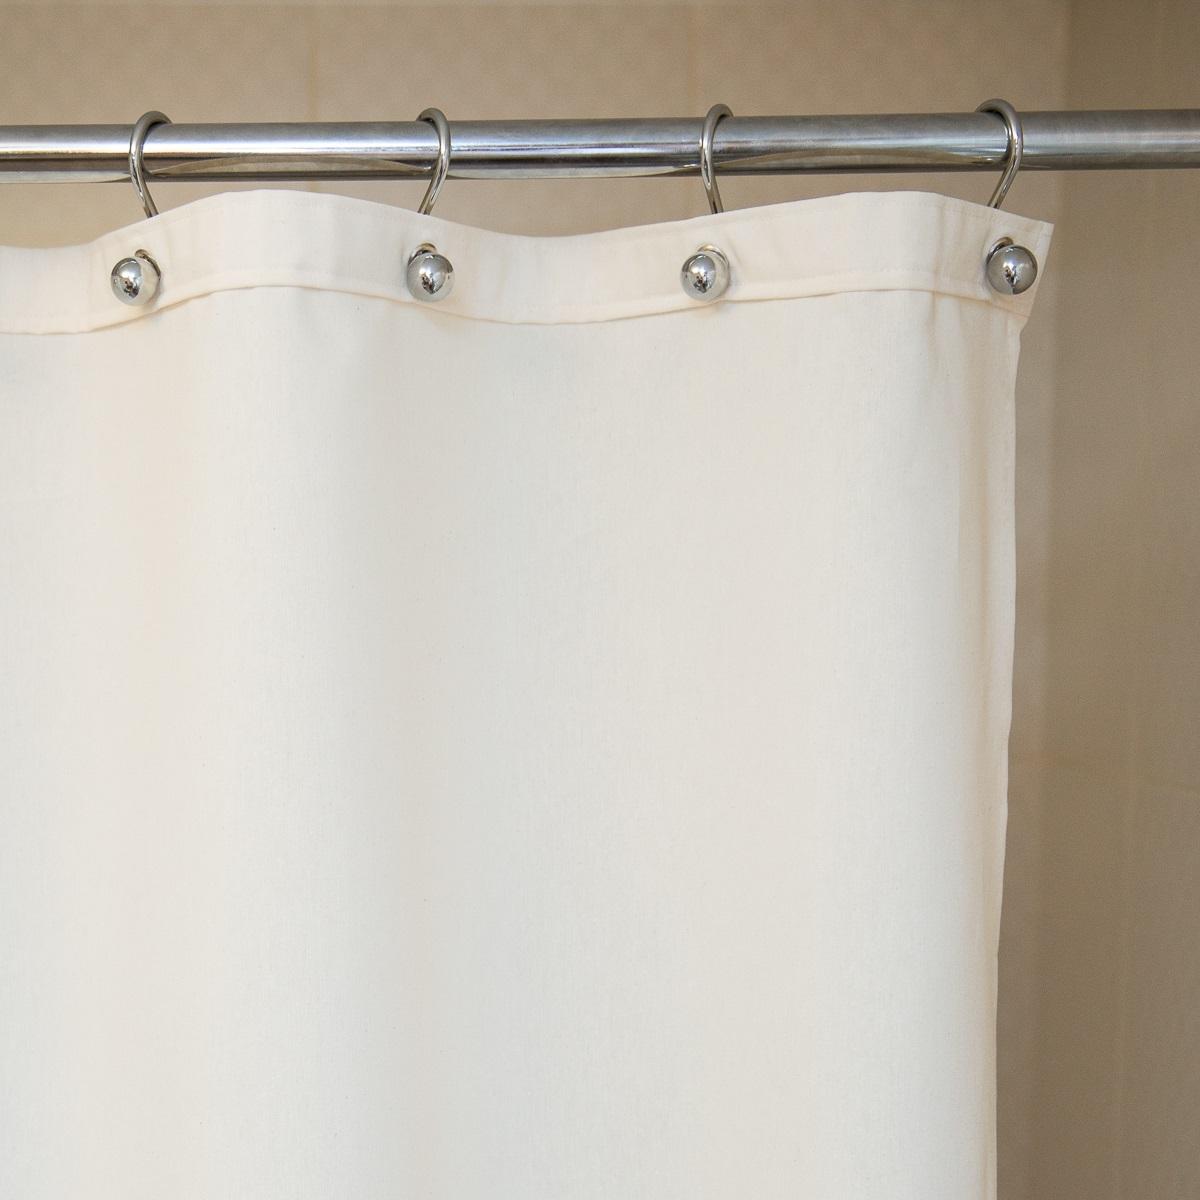 Шторки Защитная шторка для ванной 240х200 Arti-Deco Liso Beige elitnaya-shtorka-dlya-vannoy-240h200-liso-beige-ot-arti-deco-ispaniya.jpg